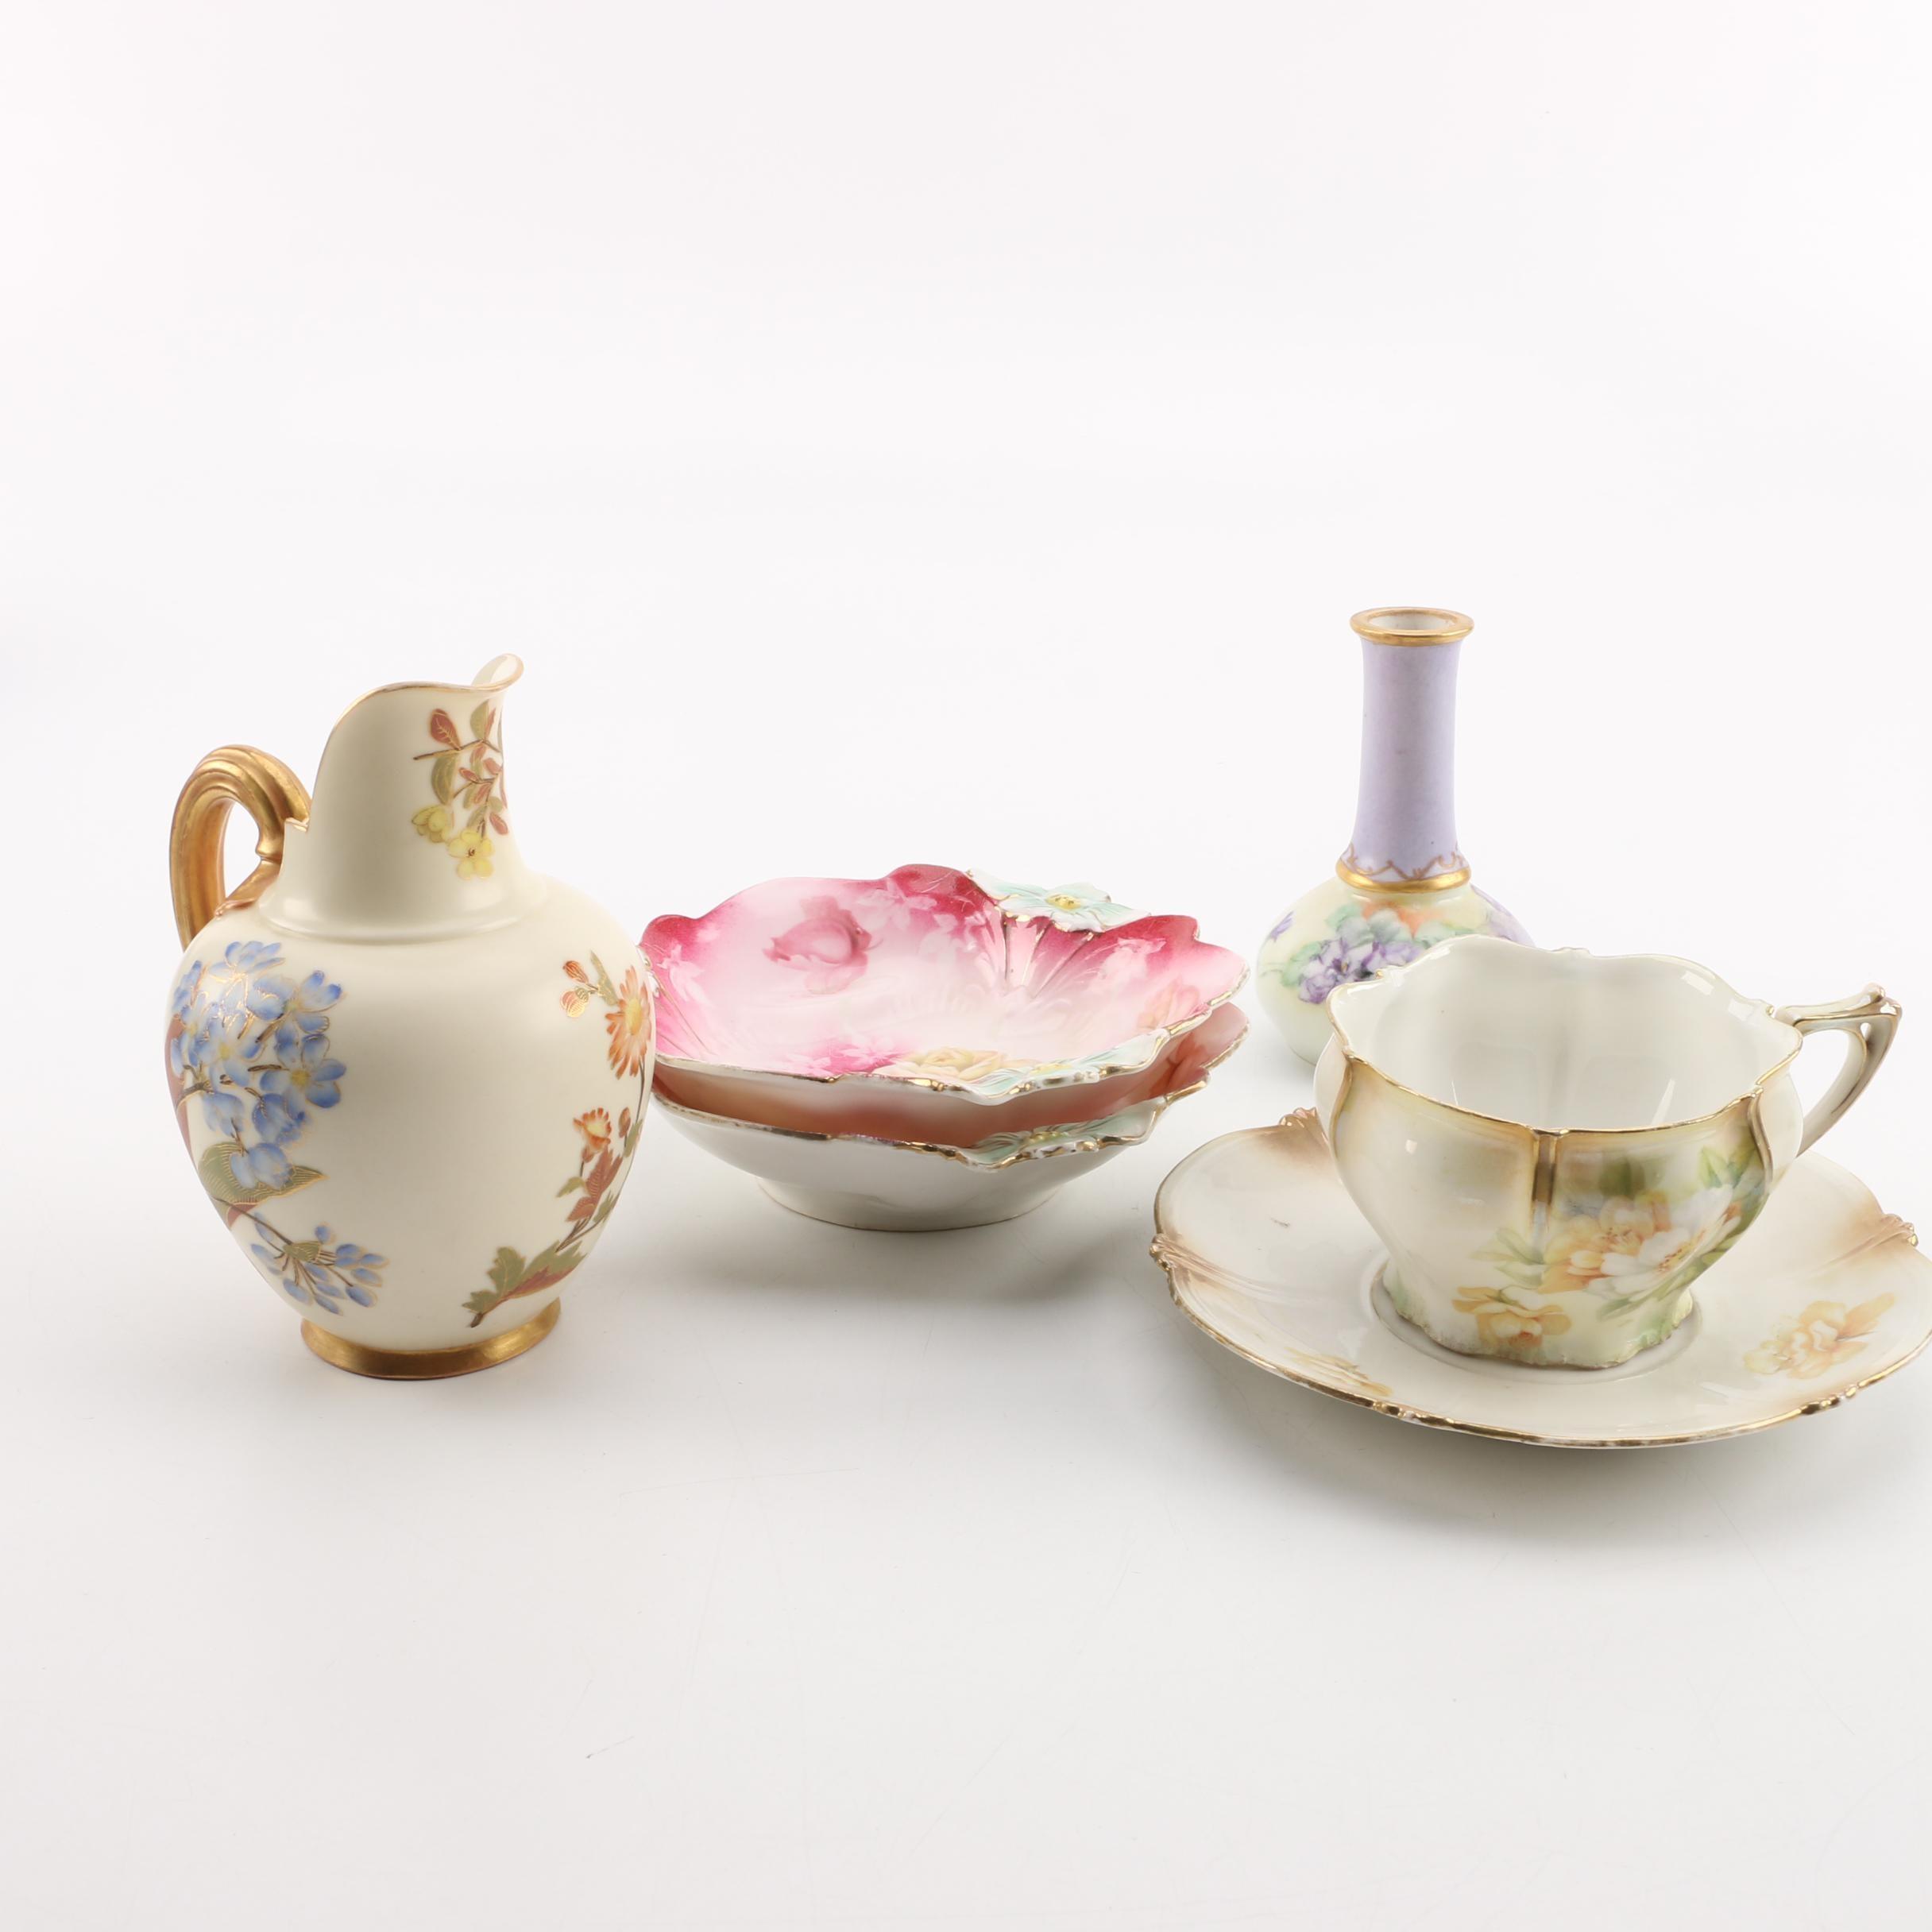 Floral Porcelain Collection including Antique Royal Worcester